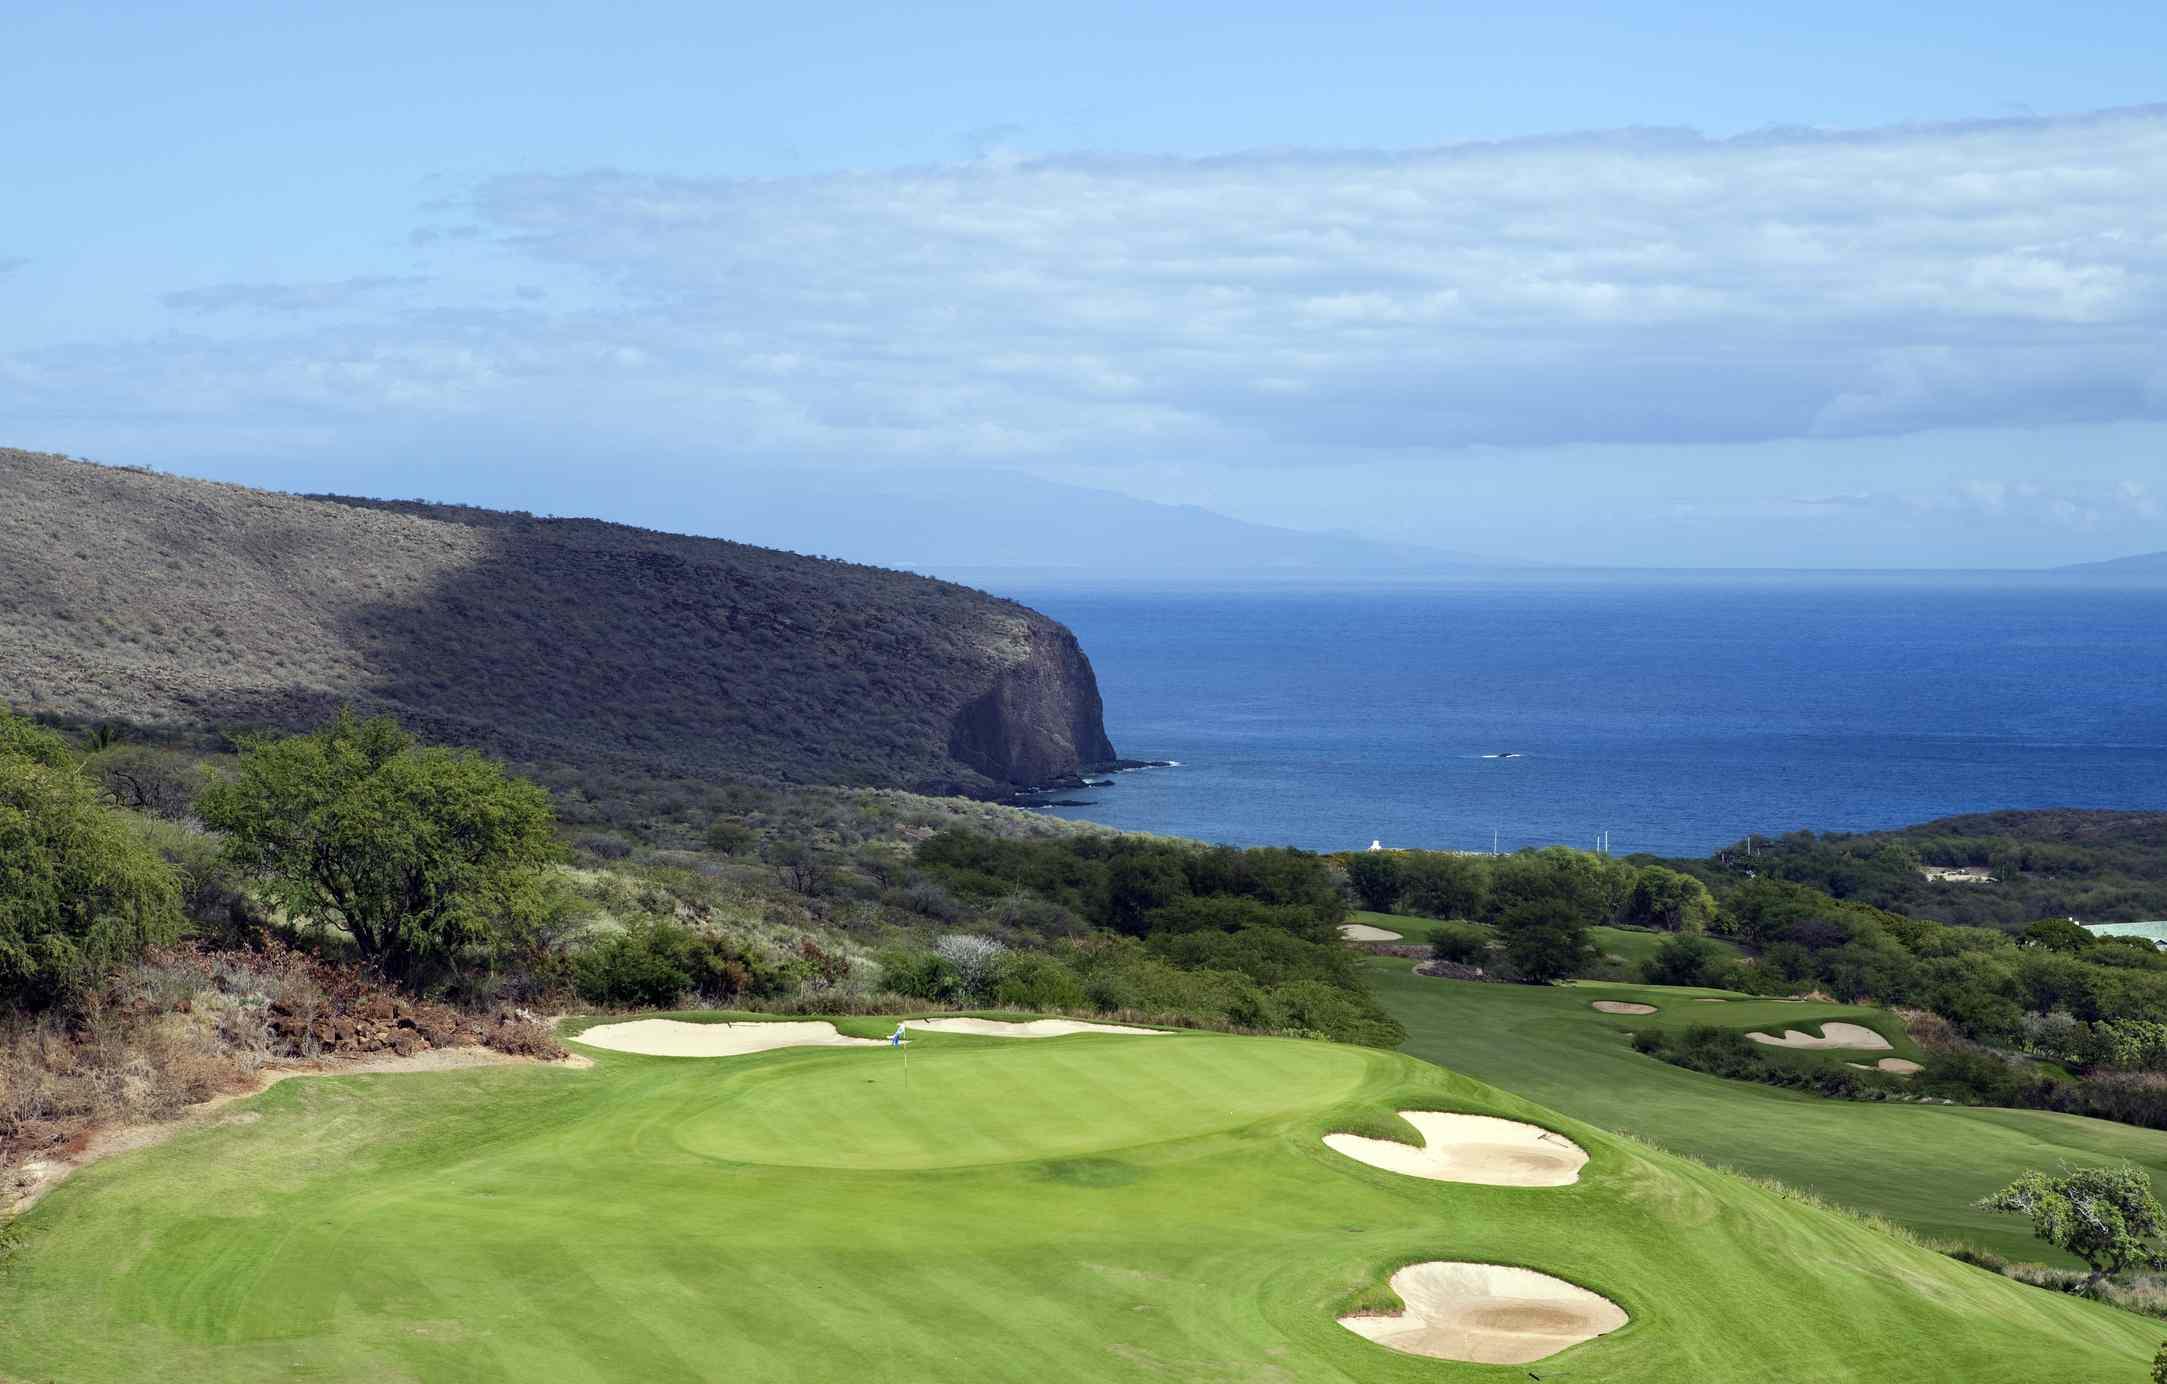 Golf Course on Lanai Hawaii